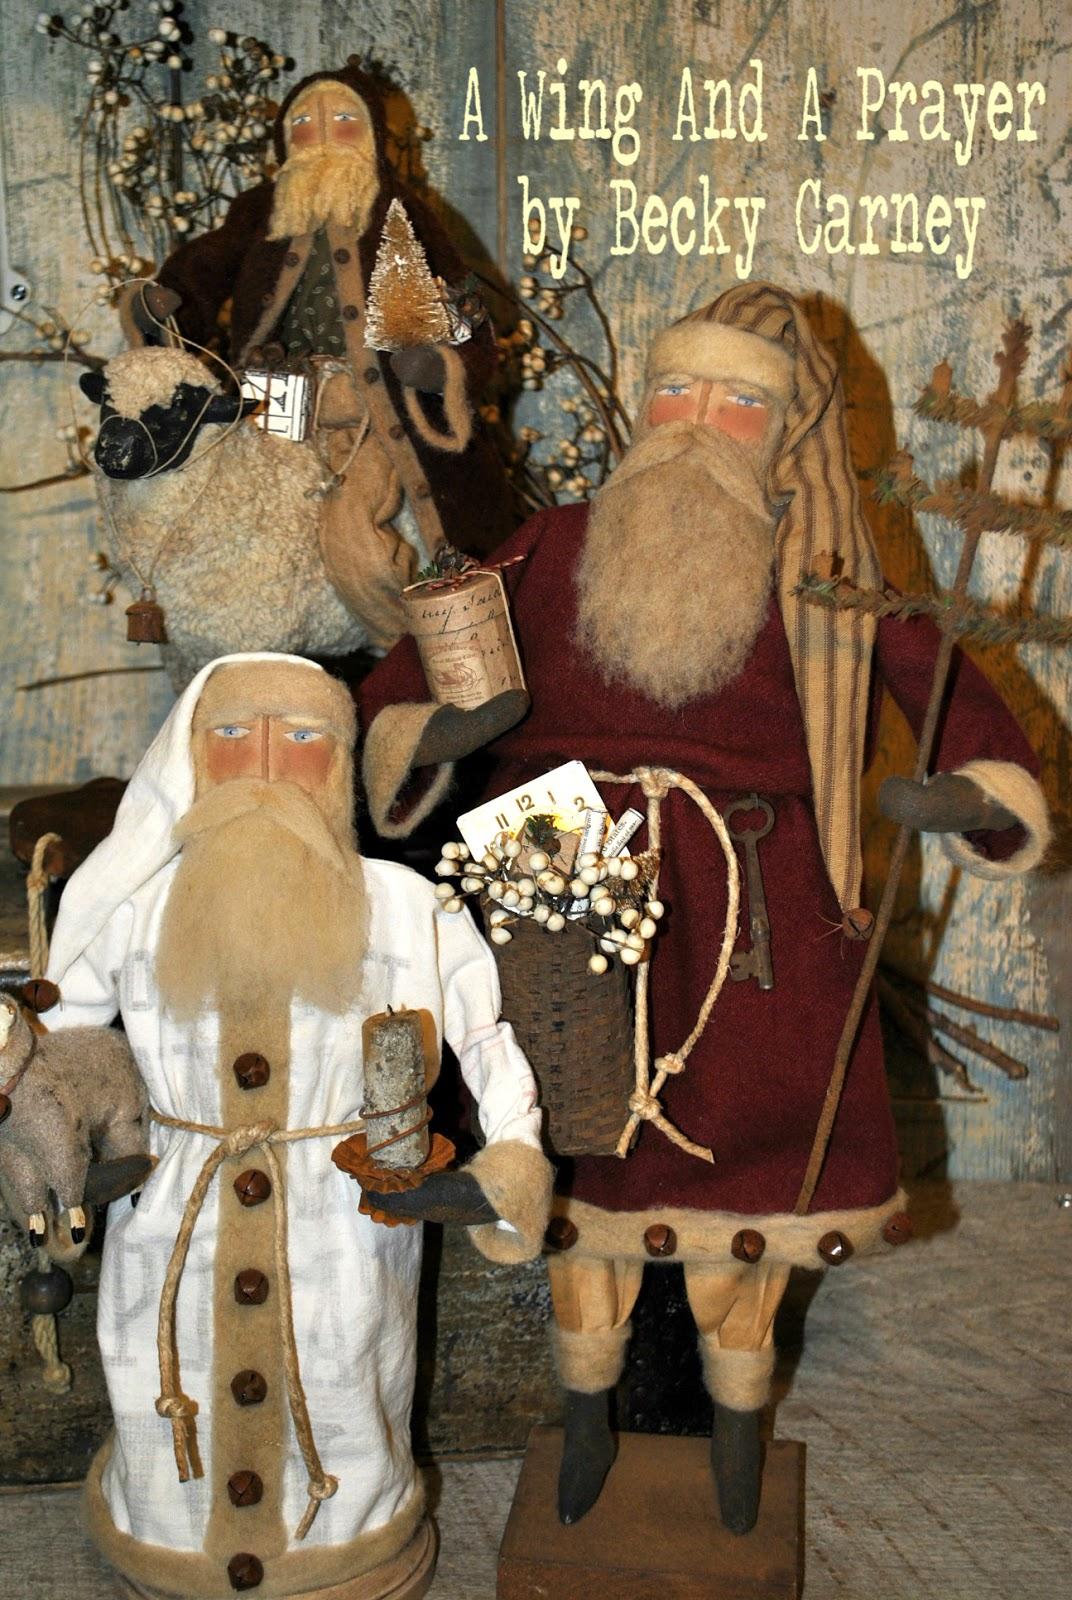 http://www.dollsbybec.blogspot.com/p/blog-page.html